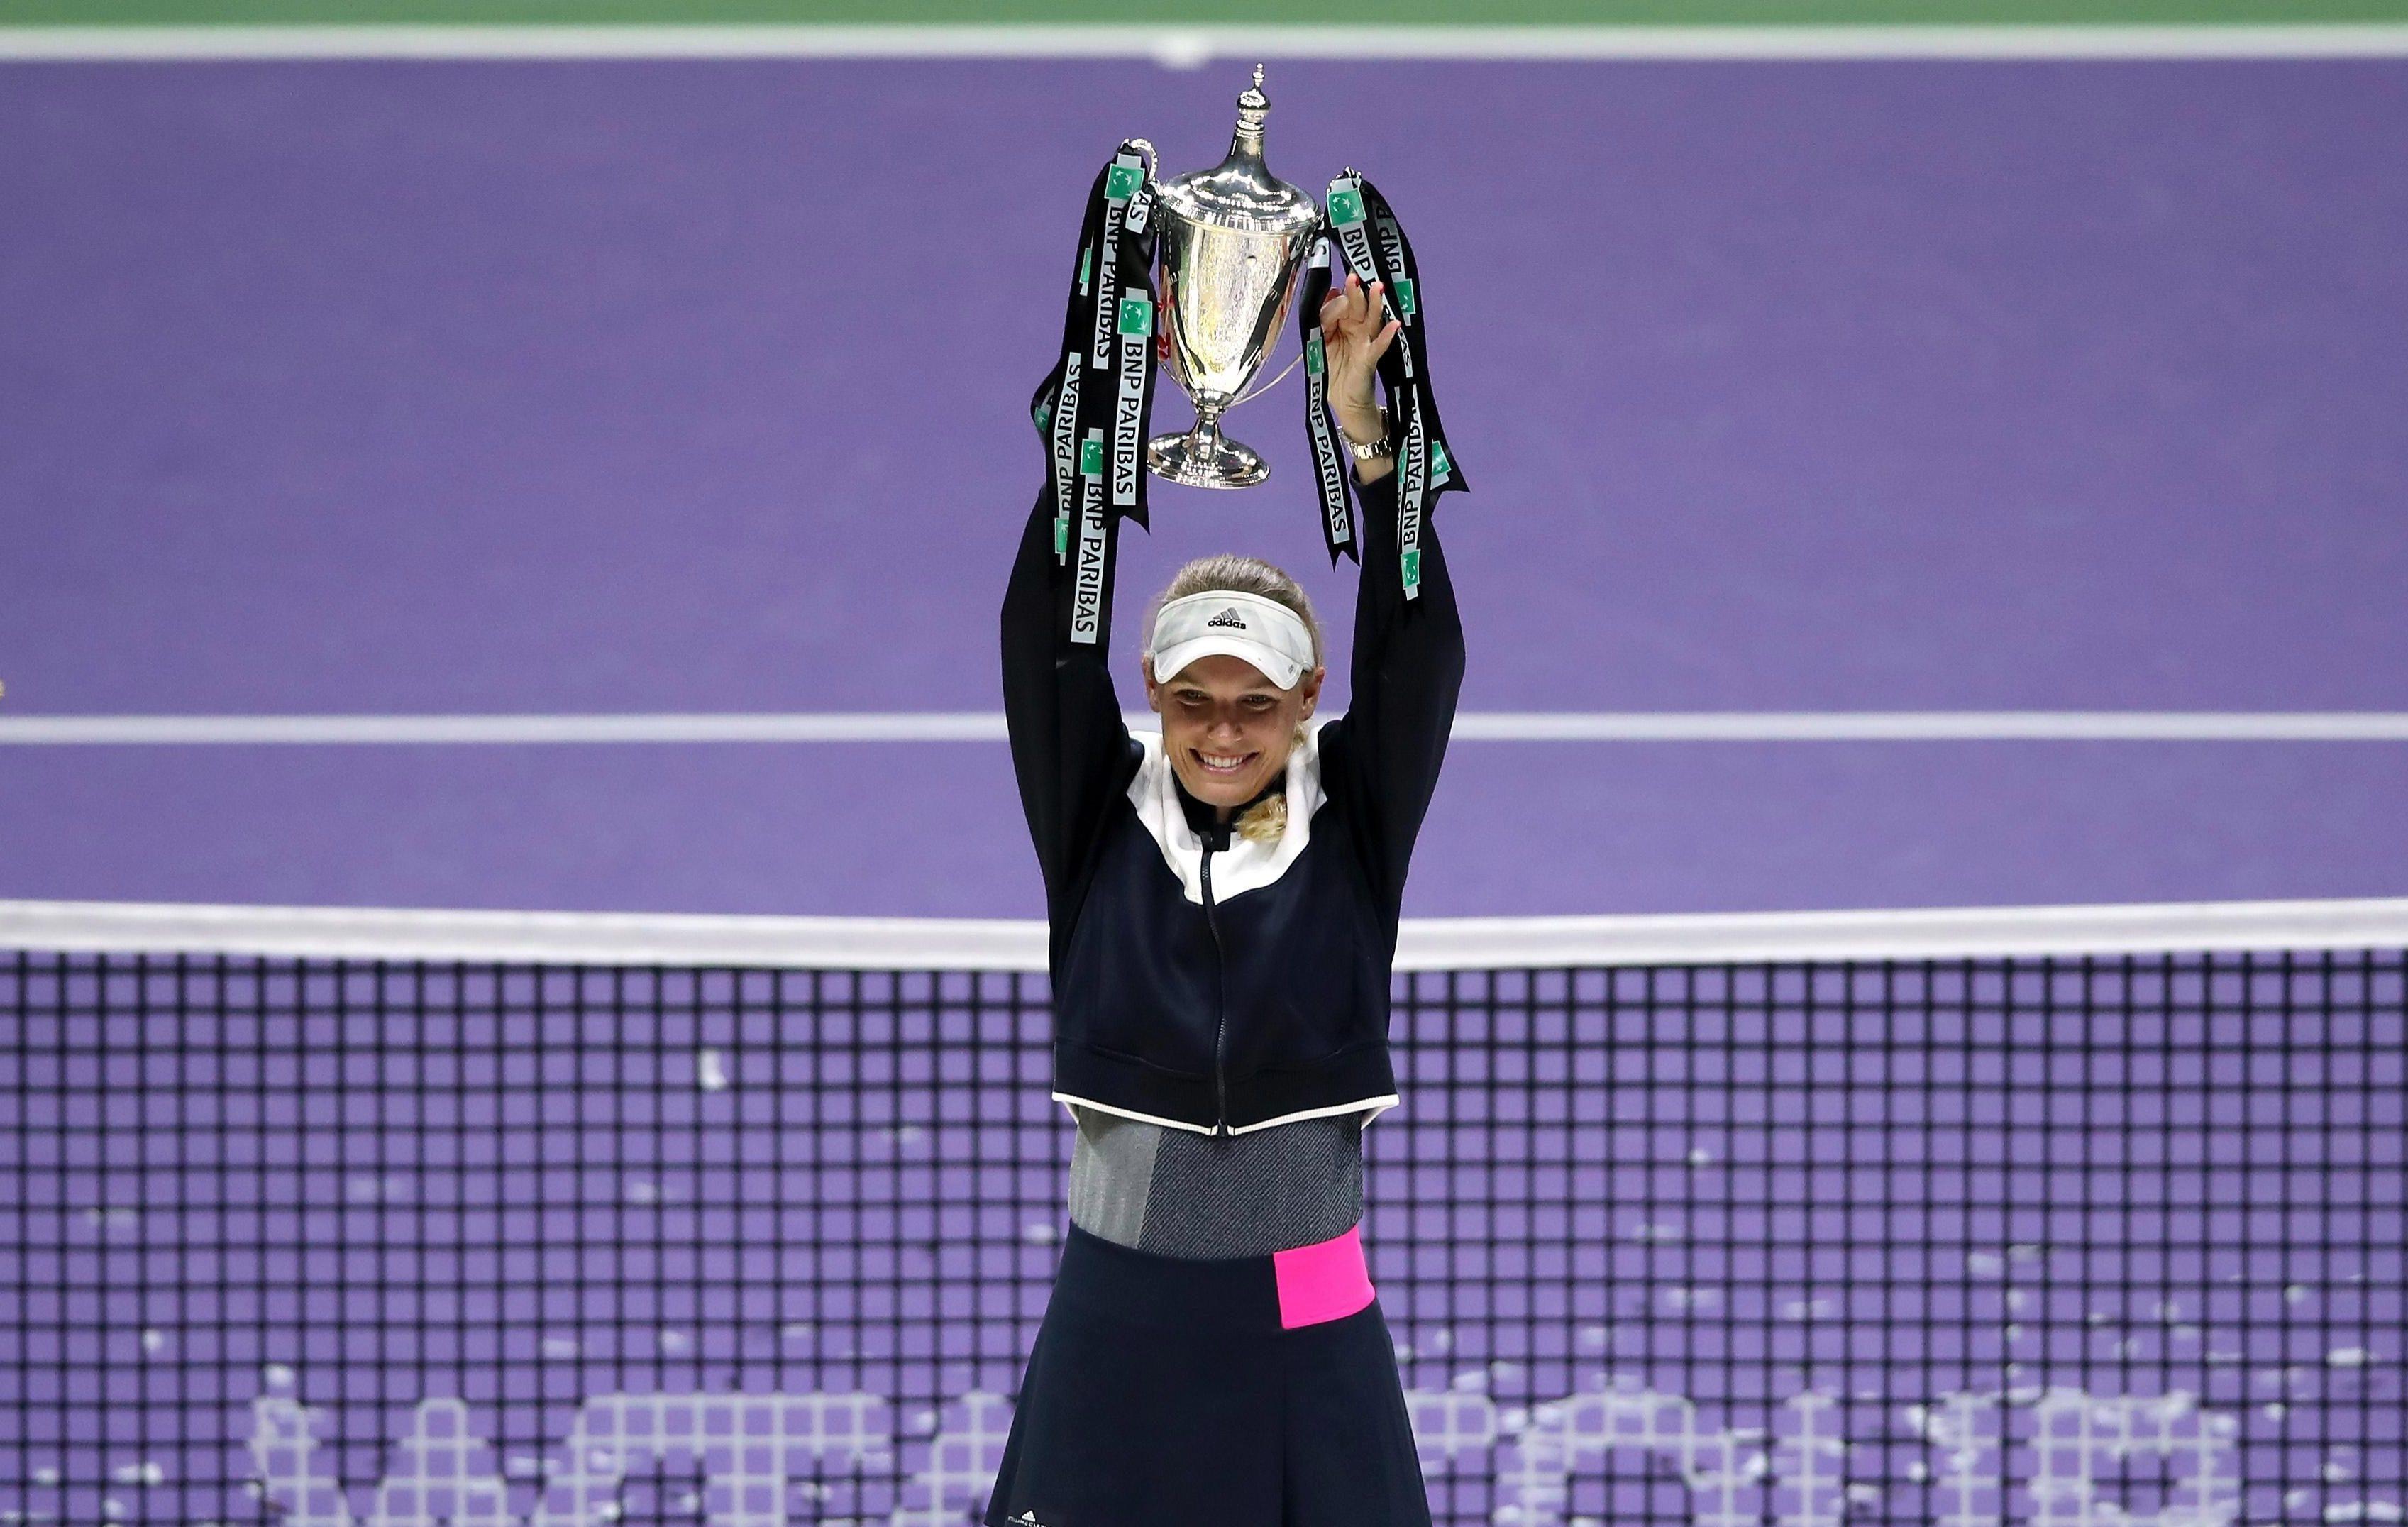 Carolina Wozniacki won the singles final 6-4,6-4 against Venus Williams